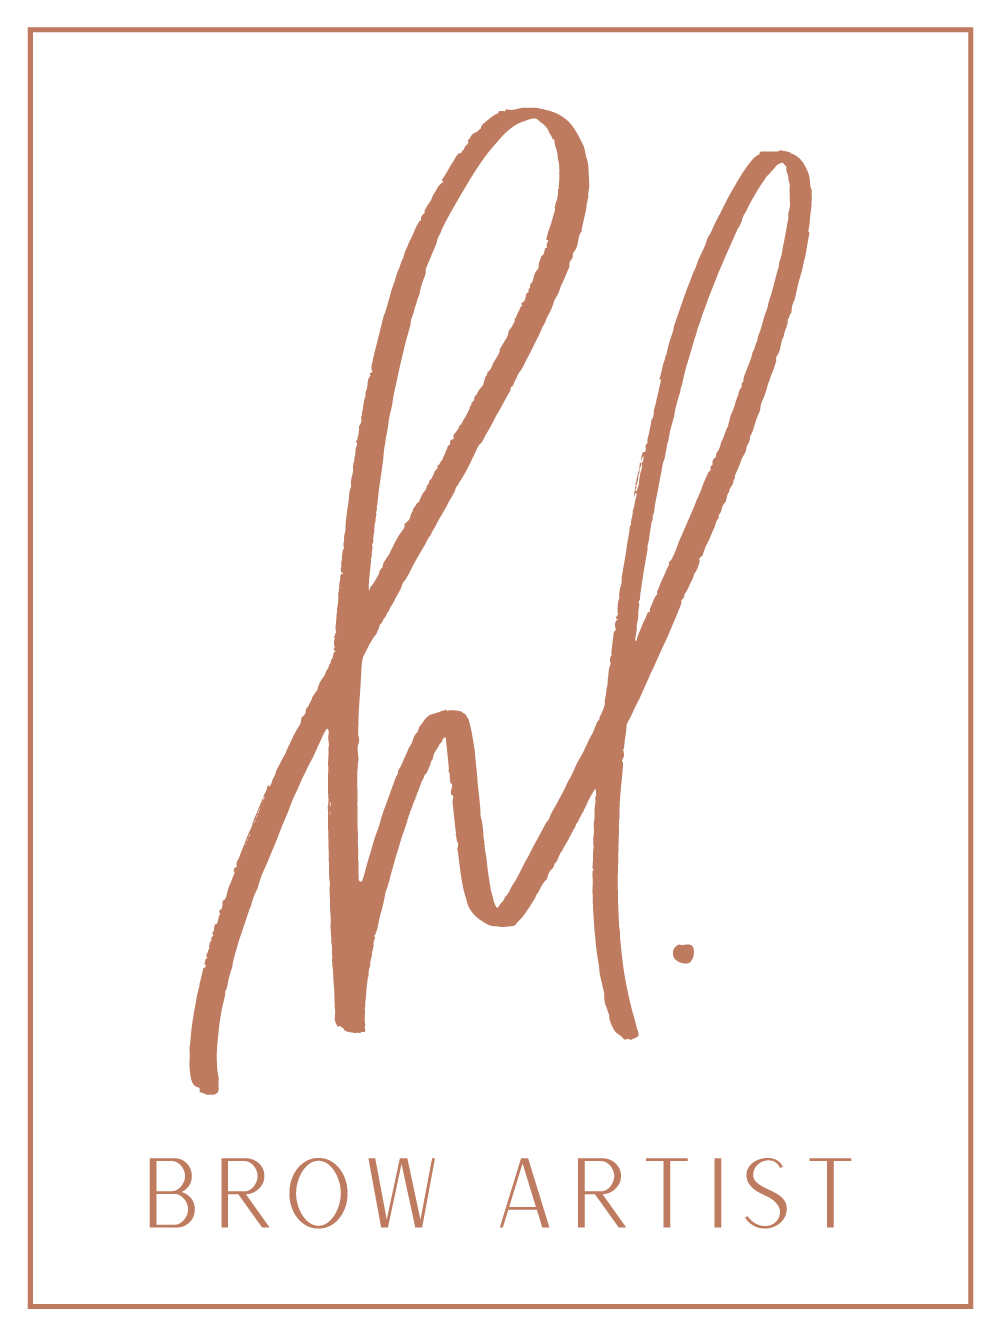 HL Brow Artist logo